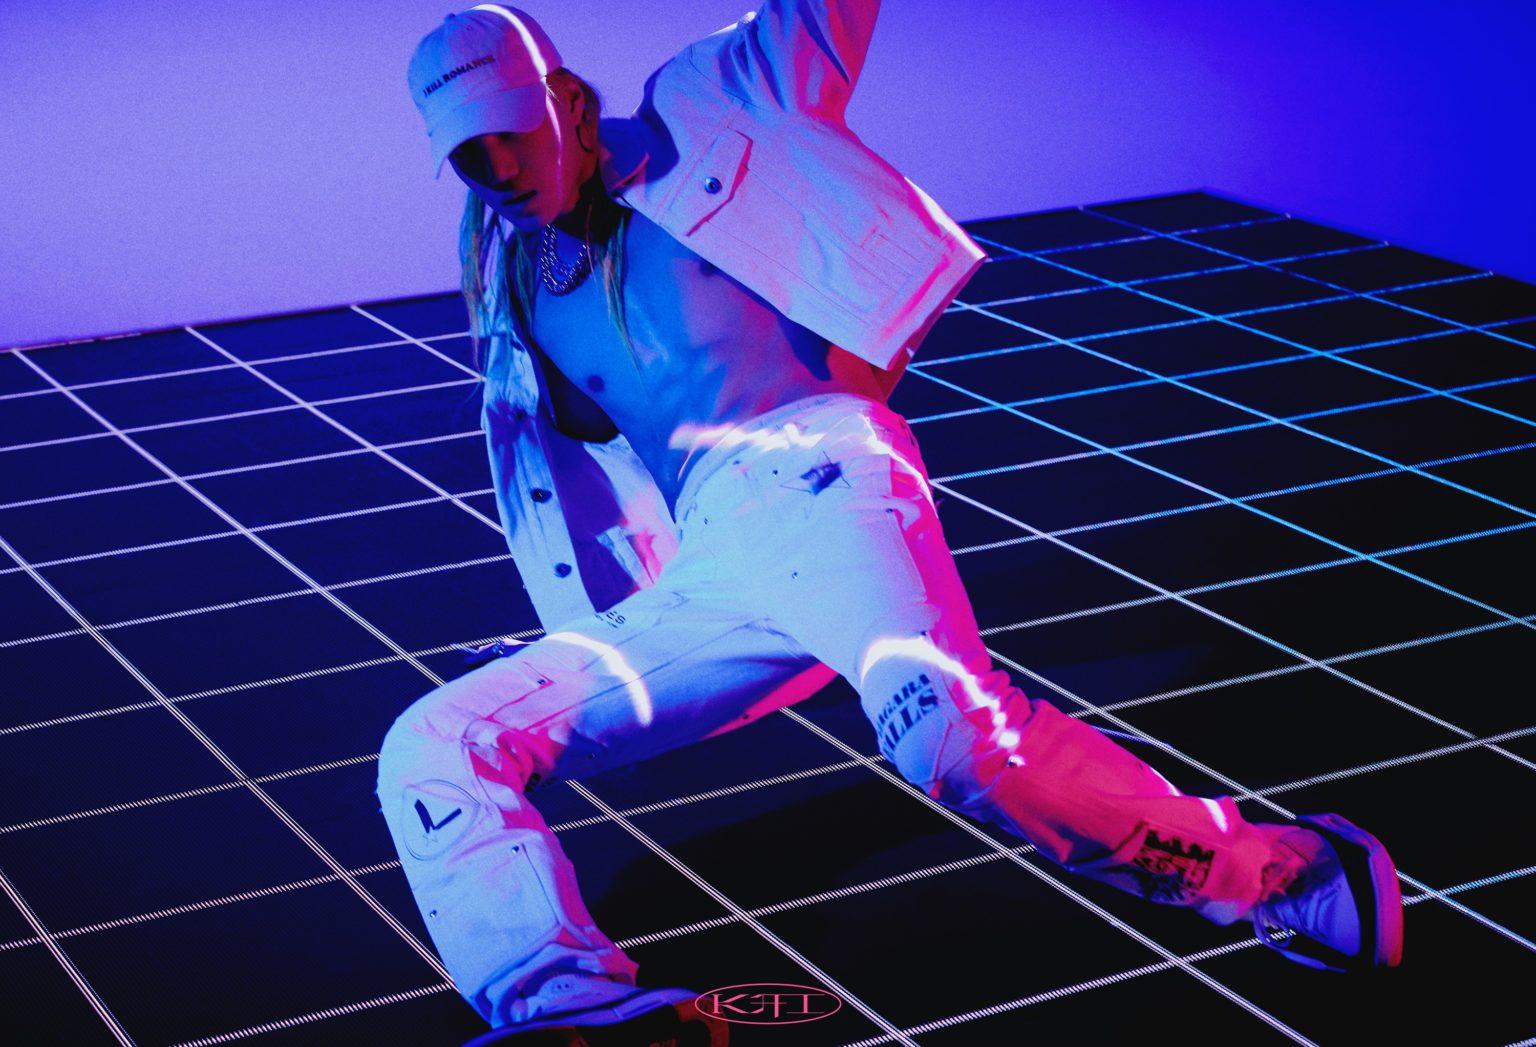 EXO's Kai Shows an Eccentric Style in The Solo Debut Album Teaser